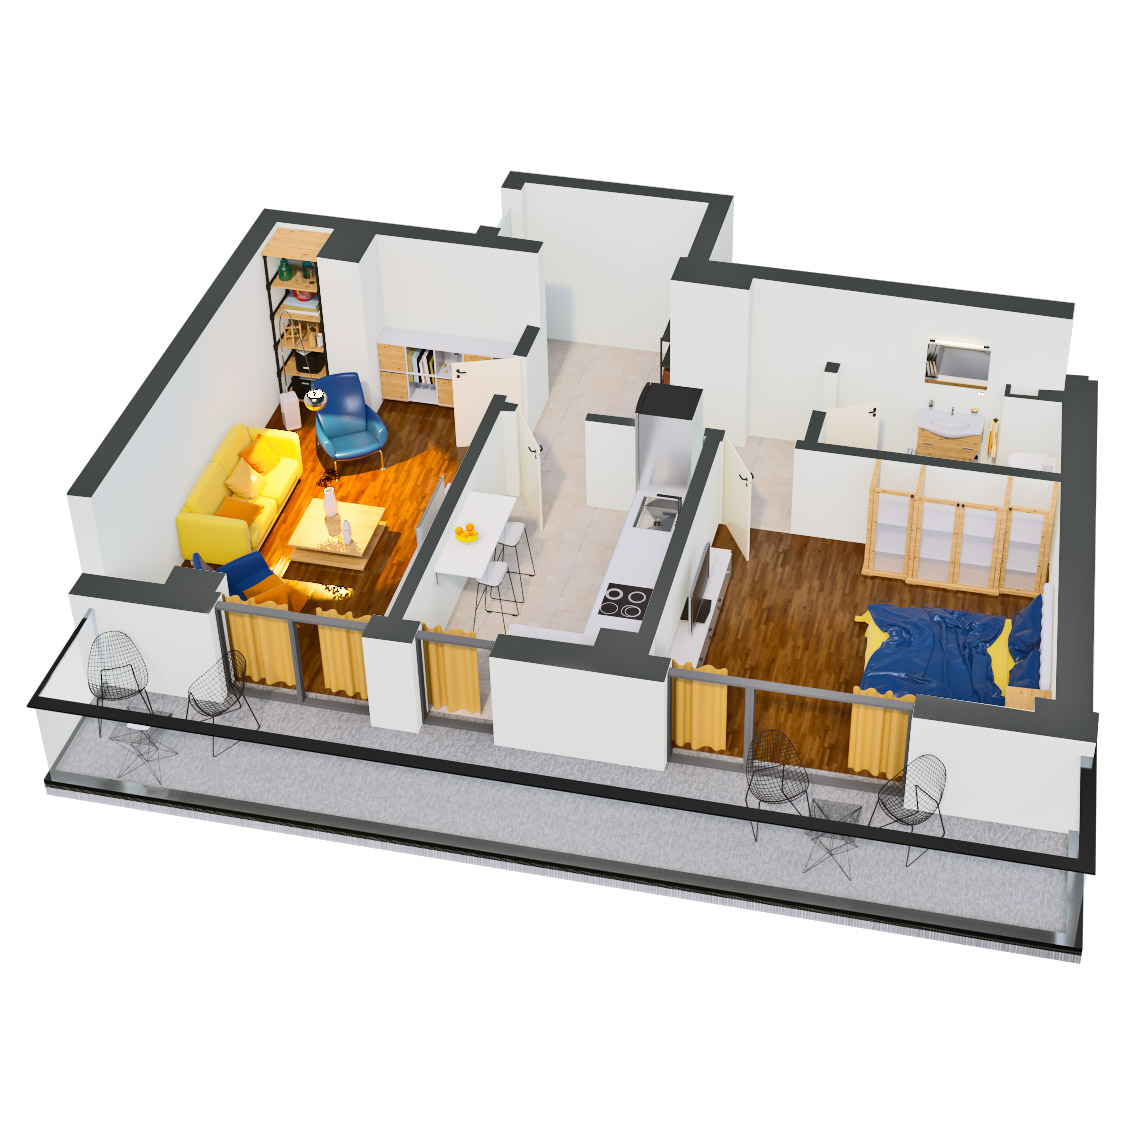 Apartament 2 camere de vanzare Bucuresti - Catedral Residence - Marriott, Piata Unirii, 13 Septembrie, Izvor - Tip 3 - T2 - C